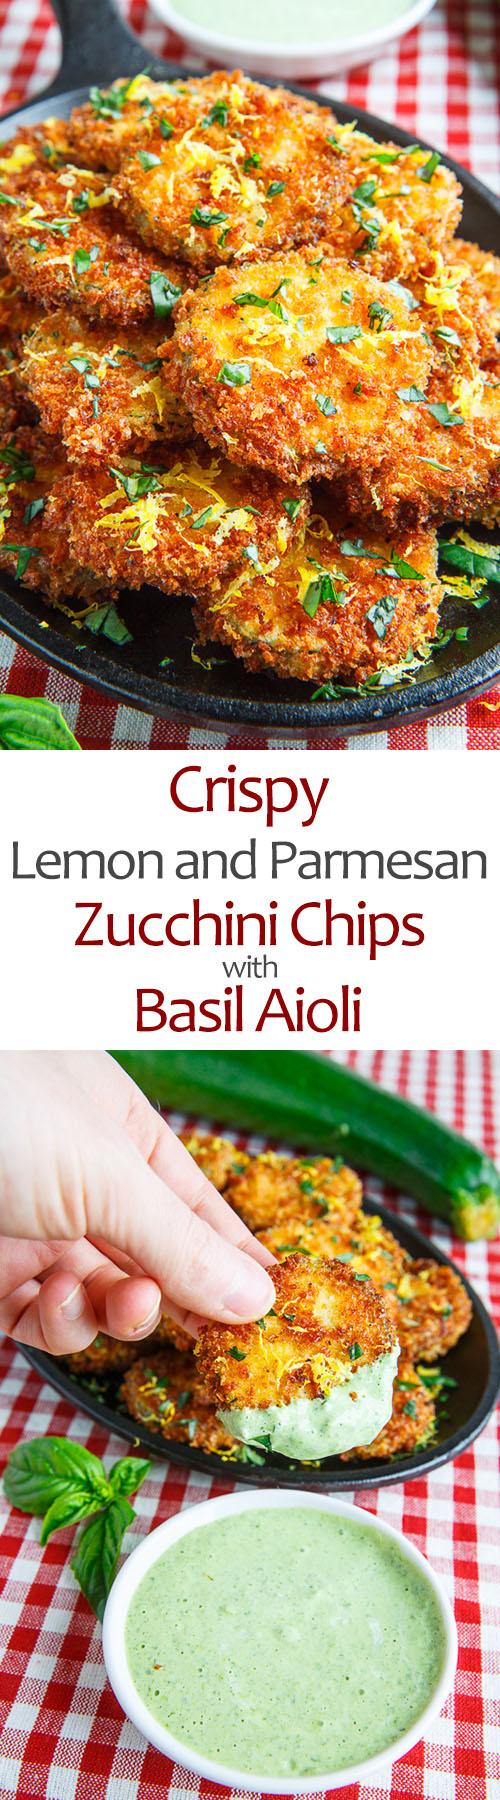 Crispy Lemon Parmesan Zucchini Chips with Basil Aioli